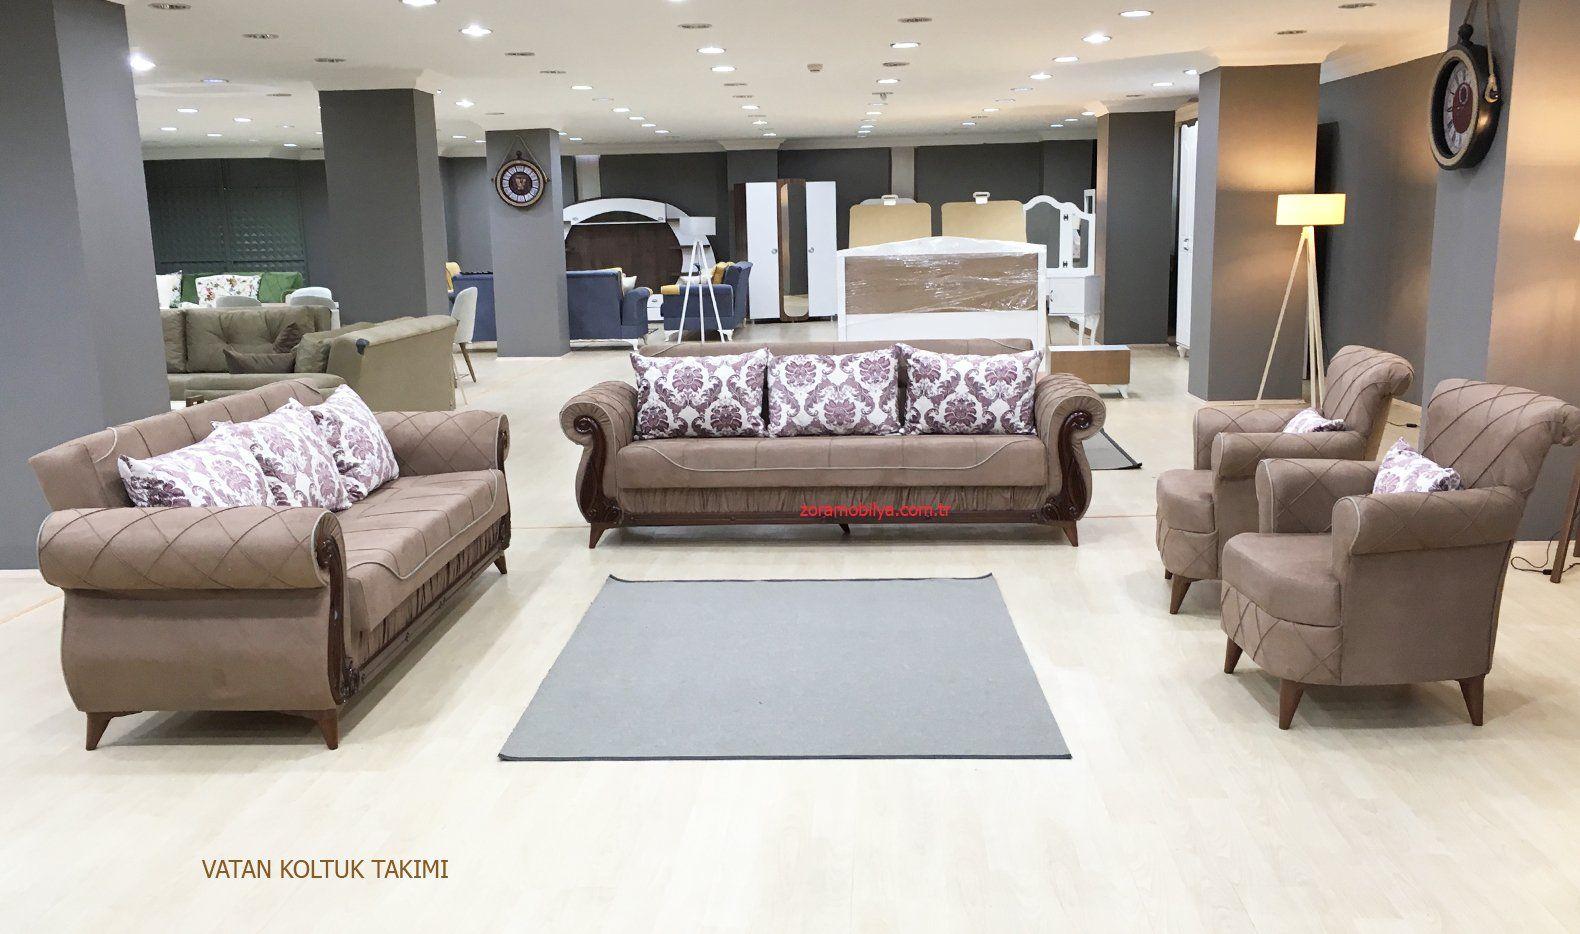 Vatan Koltuk Takimi 3 3 1 1 En Ucuz Fiyata 2 650 00 Tl Koltuktakimlari Yatakodasitakimlari Rapsodi Yemekodasitakimlari Home Decor Furniture Sectional Couch